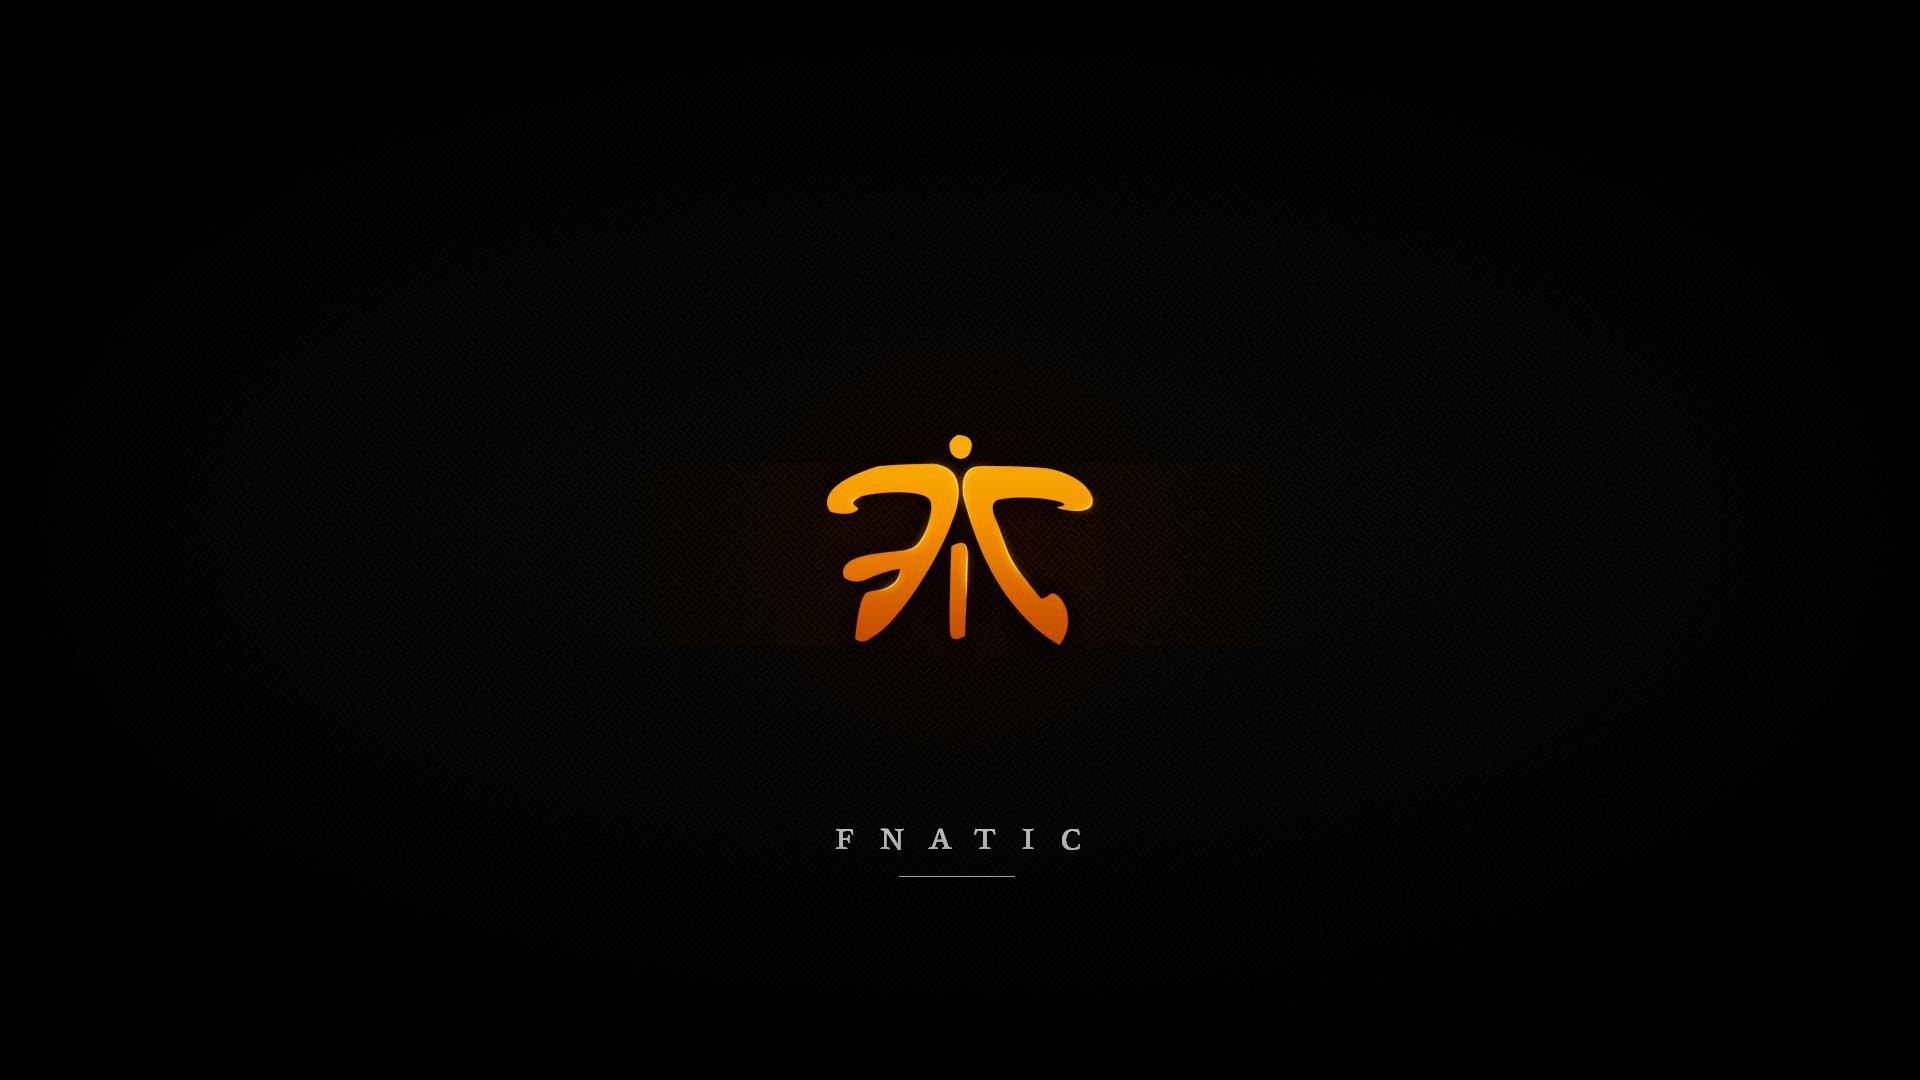 Image-Counter-Strike-Logo-Emblem-fnatic-csgo-offensive-